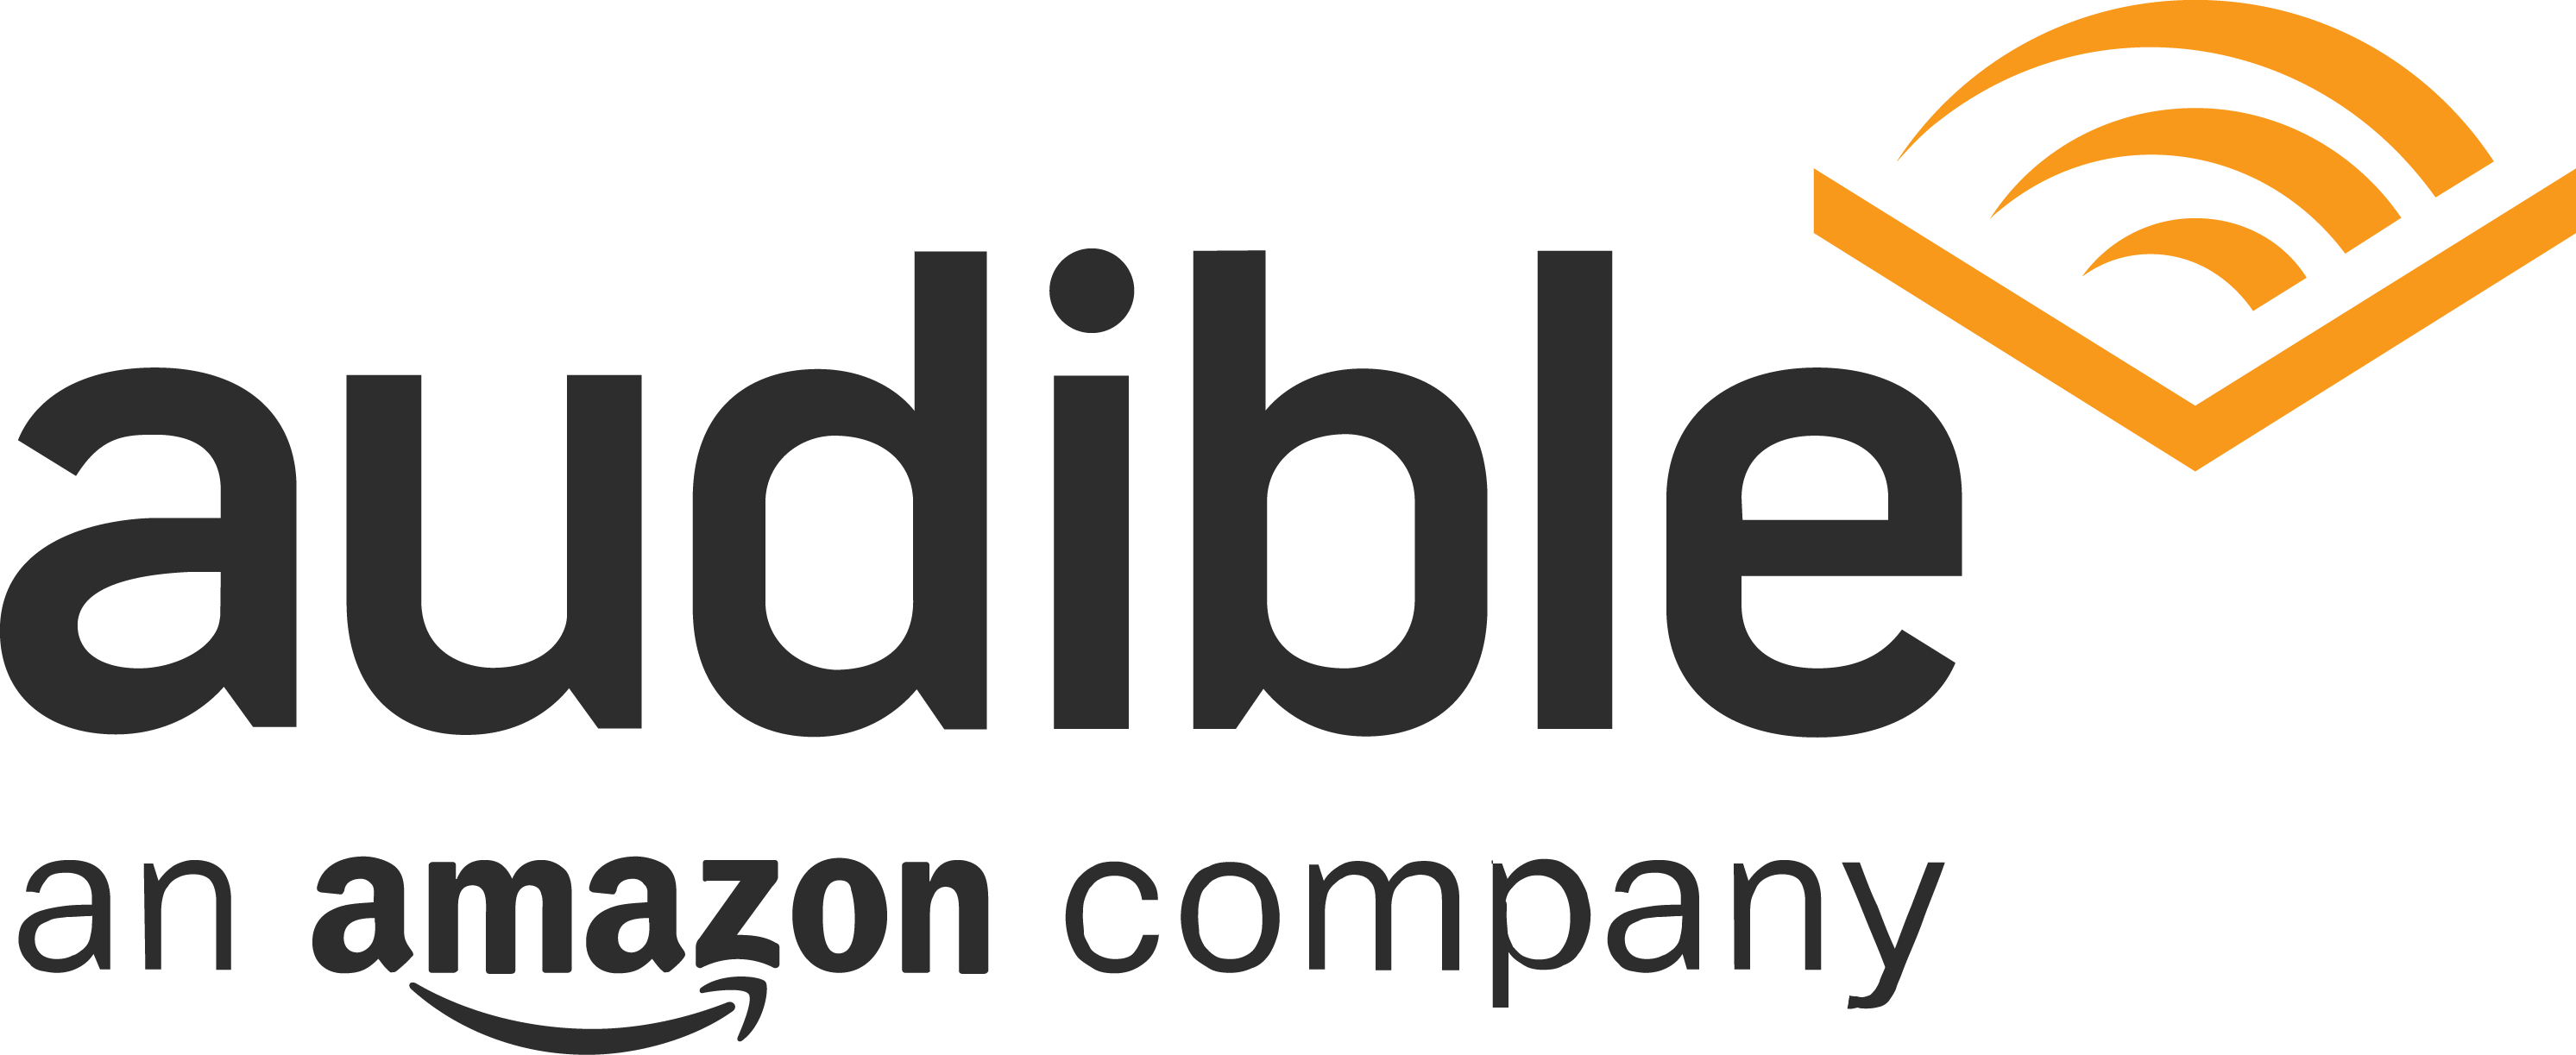 Audible Logo png